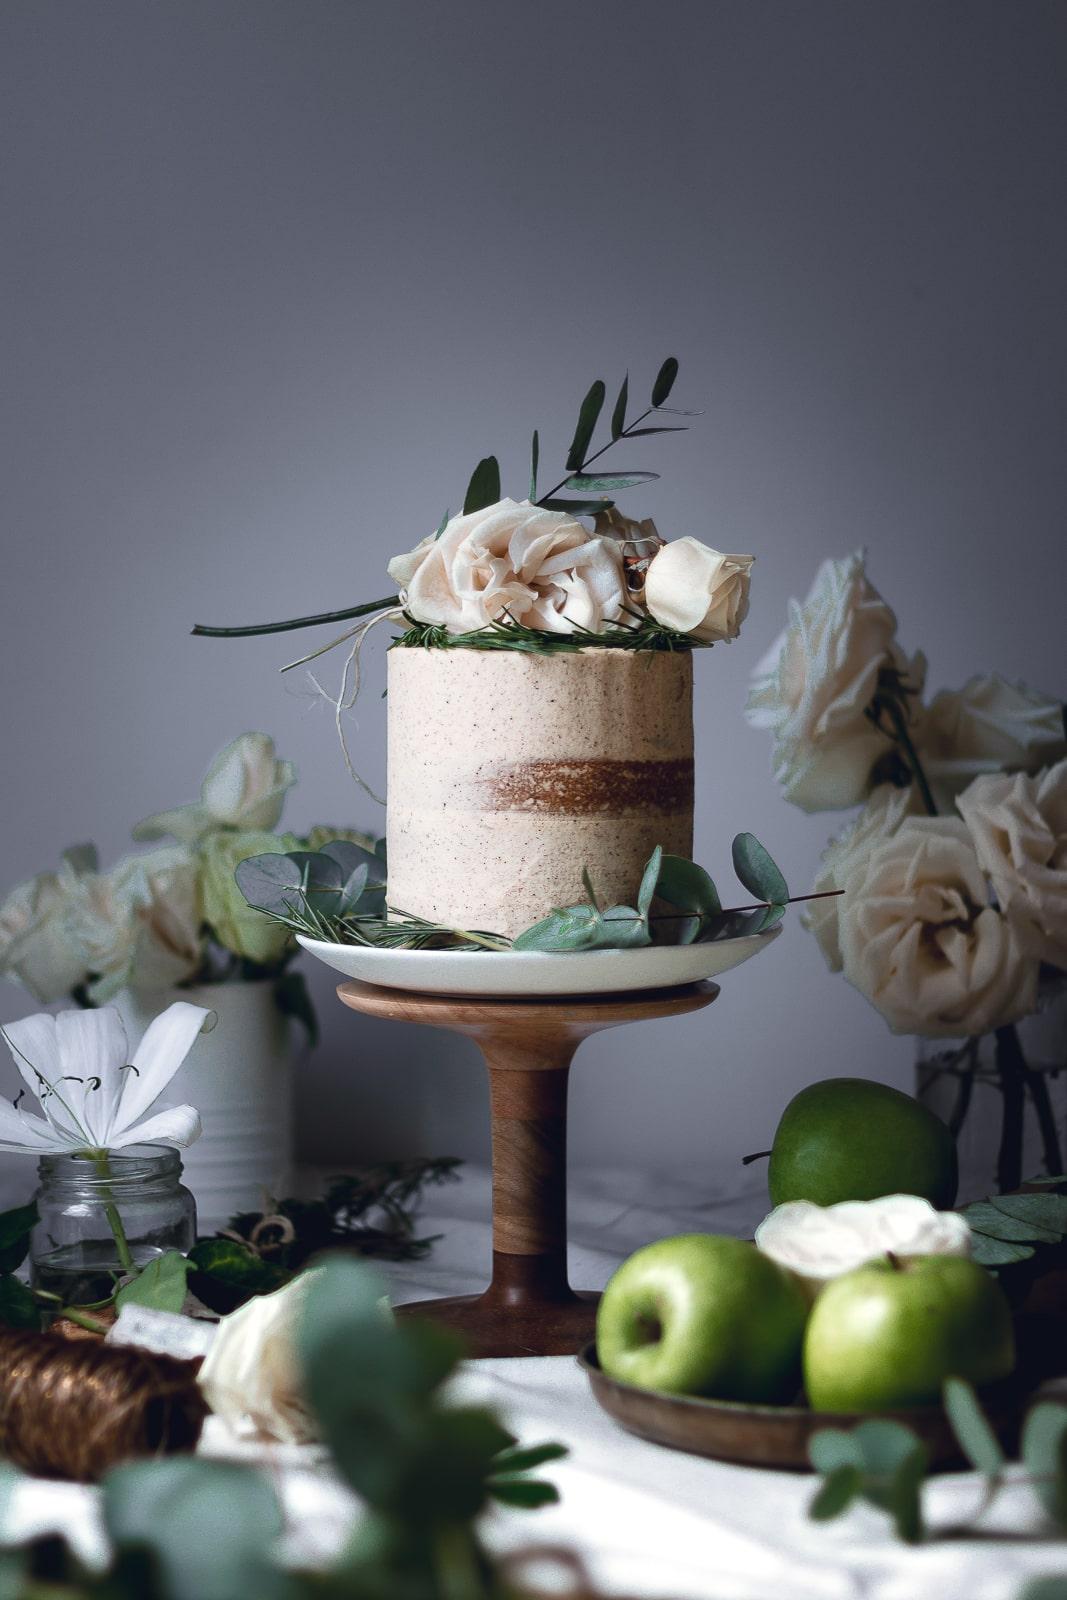 gingerbread-apple-cake-4391